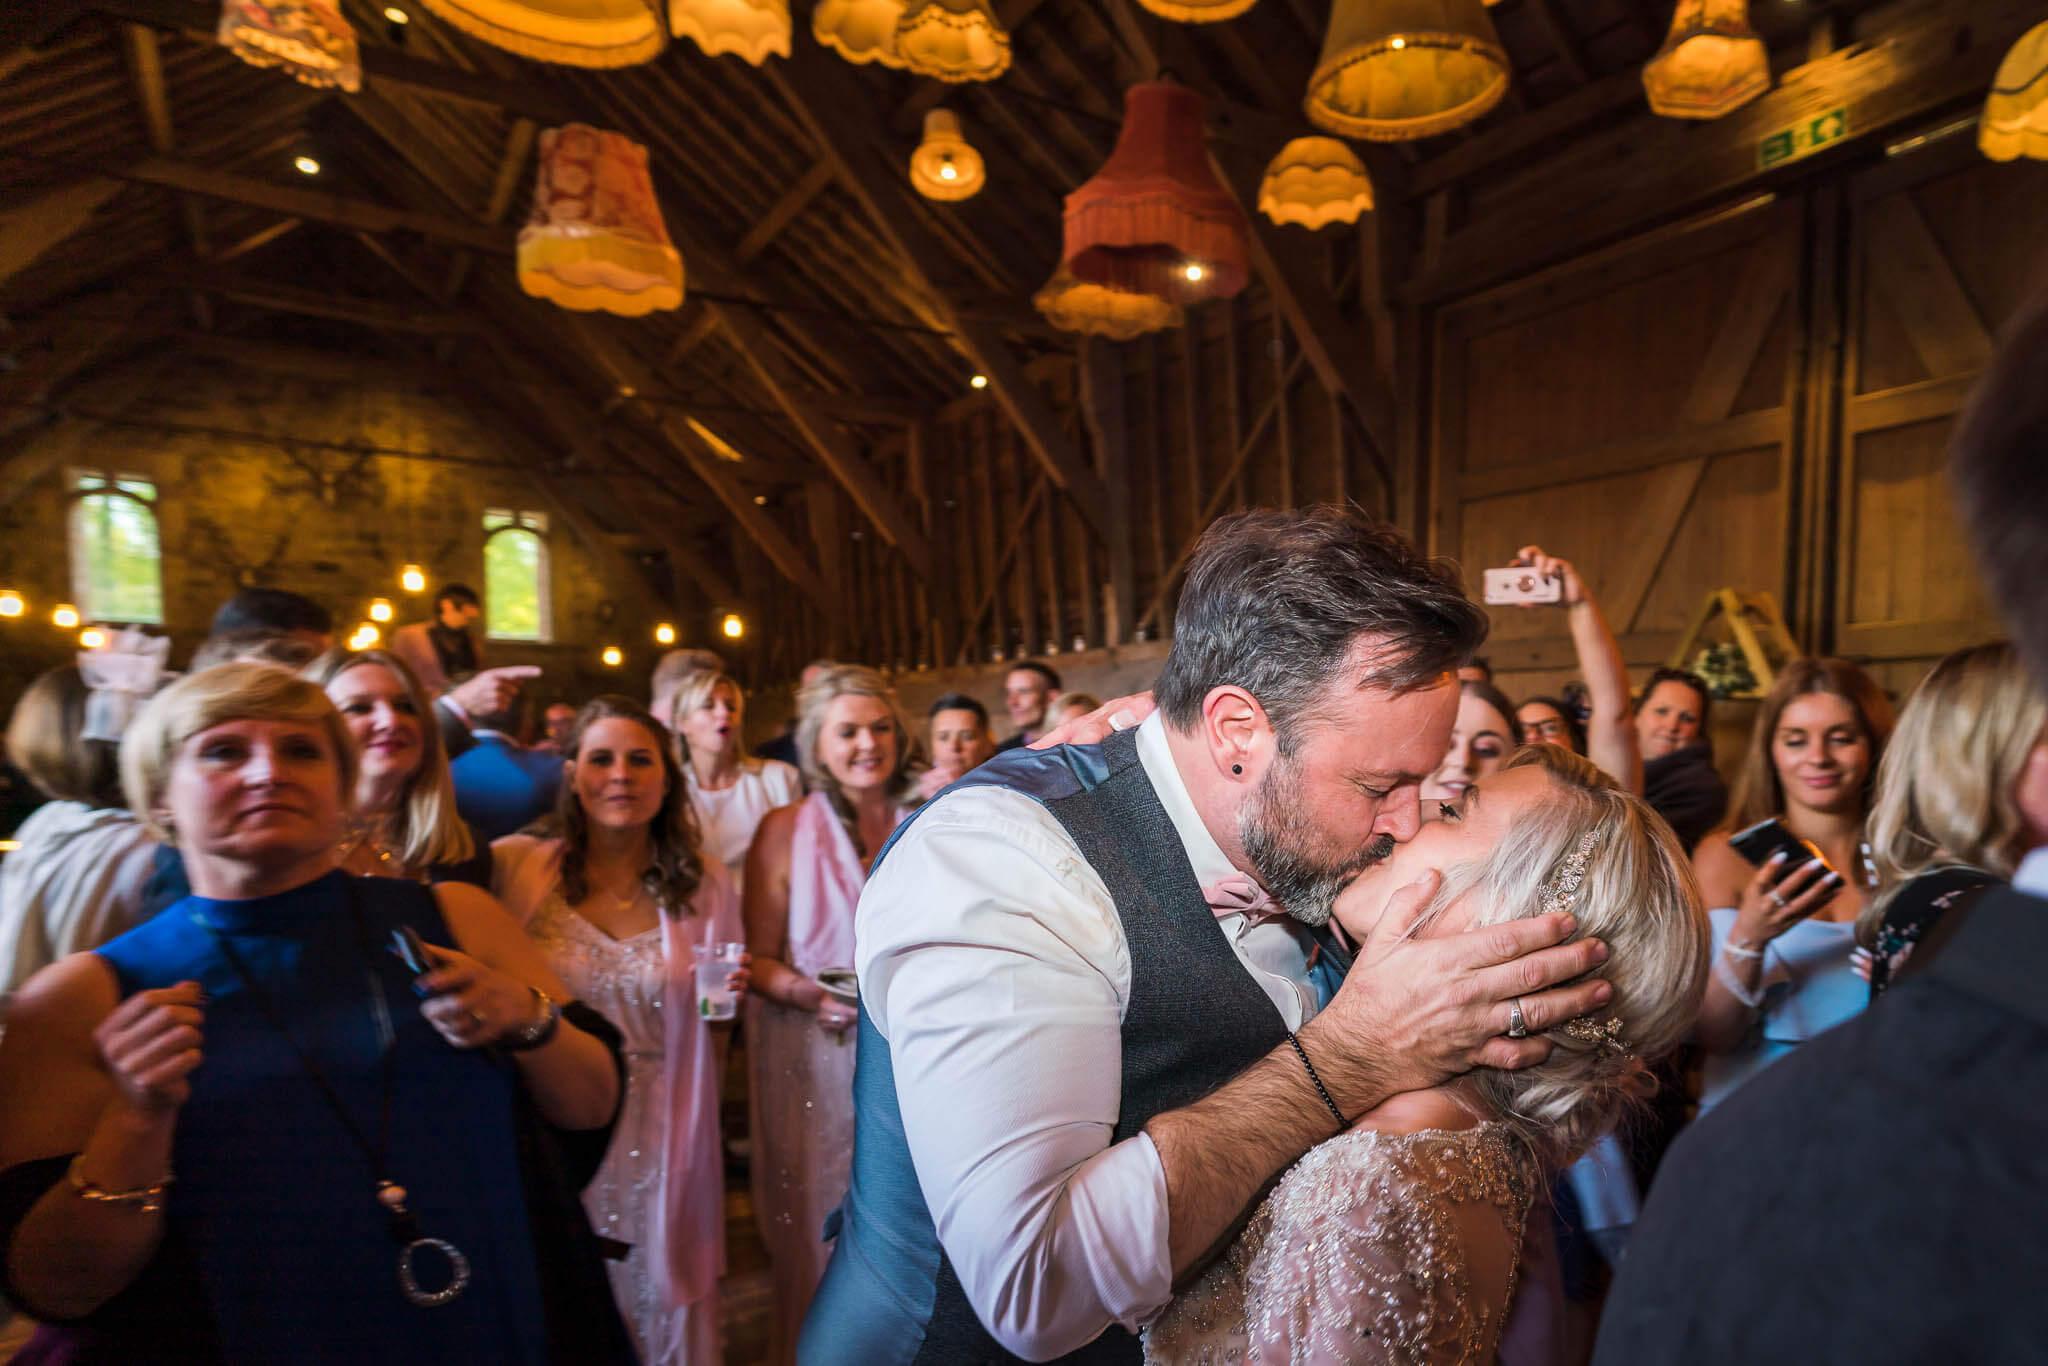 bristol-and-somerset-wedding-photographer-44.jpg